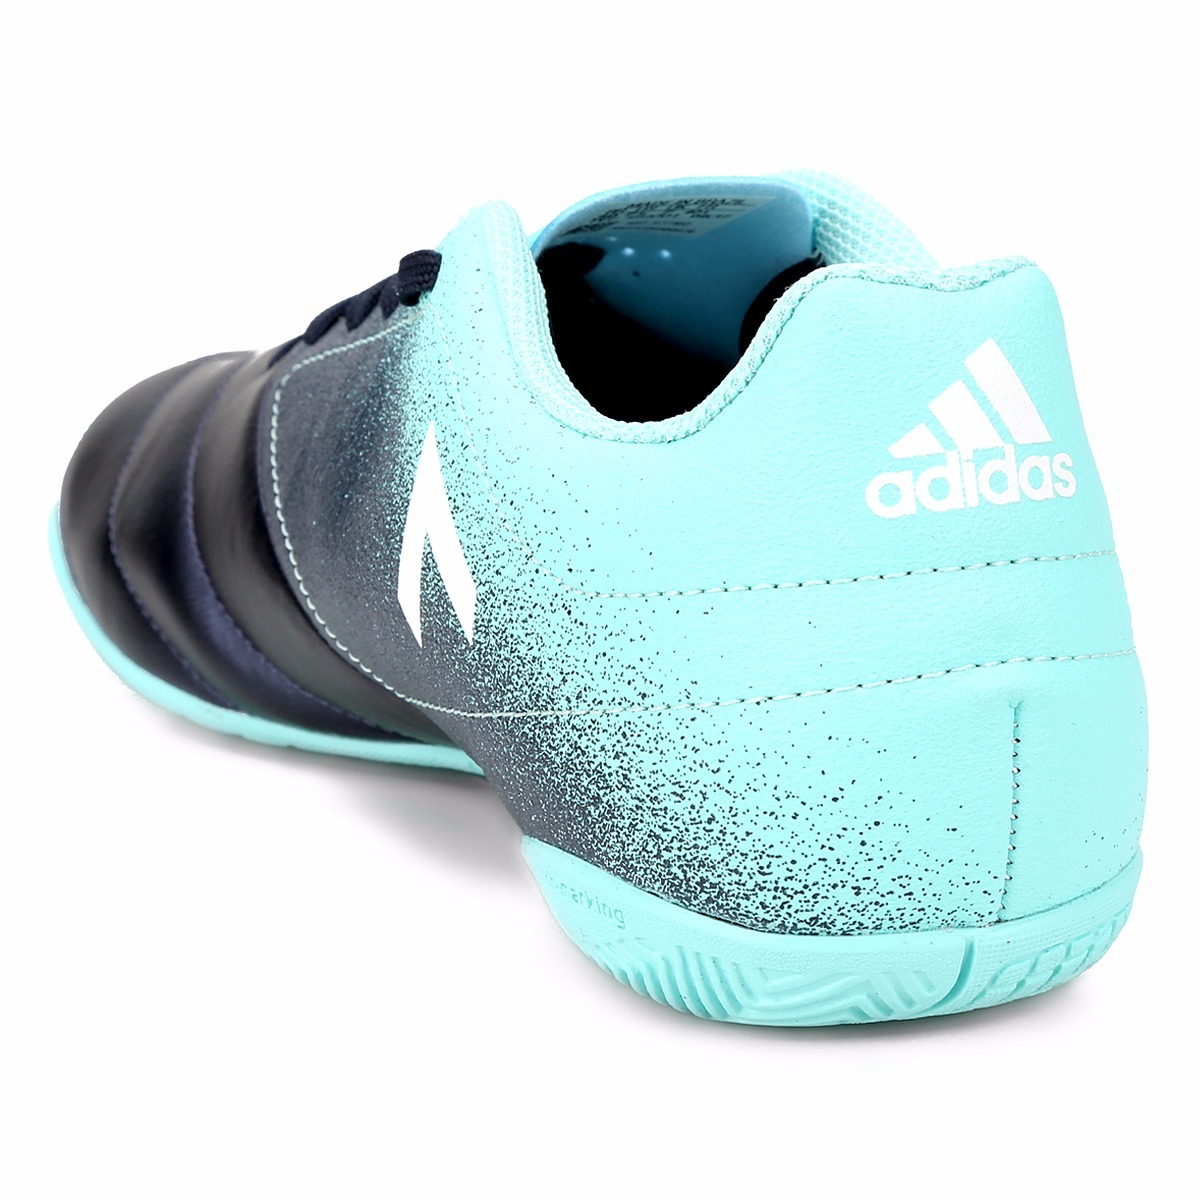 b8ca0cbb29 ... Carregando zoom... chuteira futsal adidas ace 17.4 in masculino new  high c63dc 20726 ...